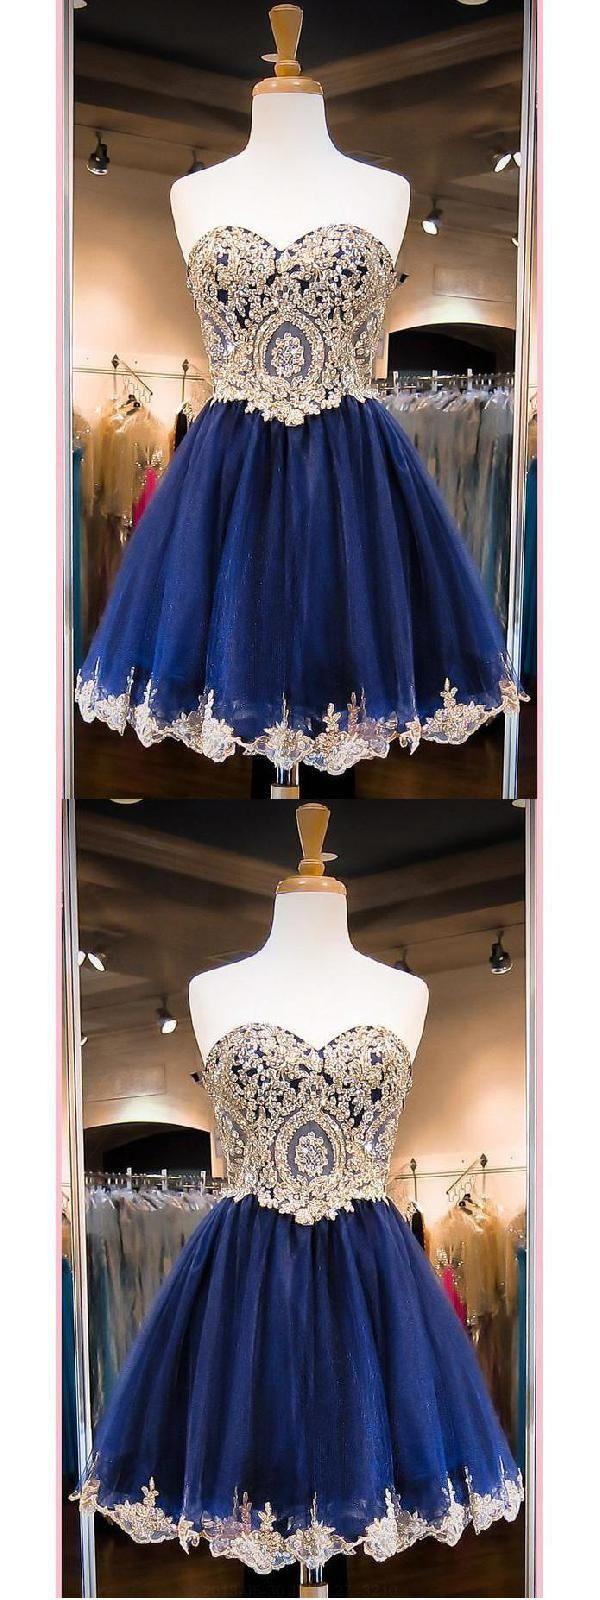 Absorbing prom dresses short prom dresses homecoming dresses